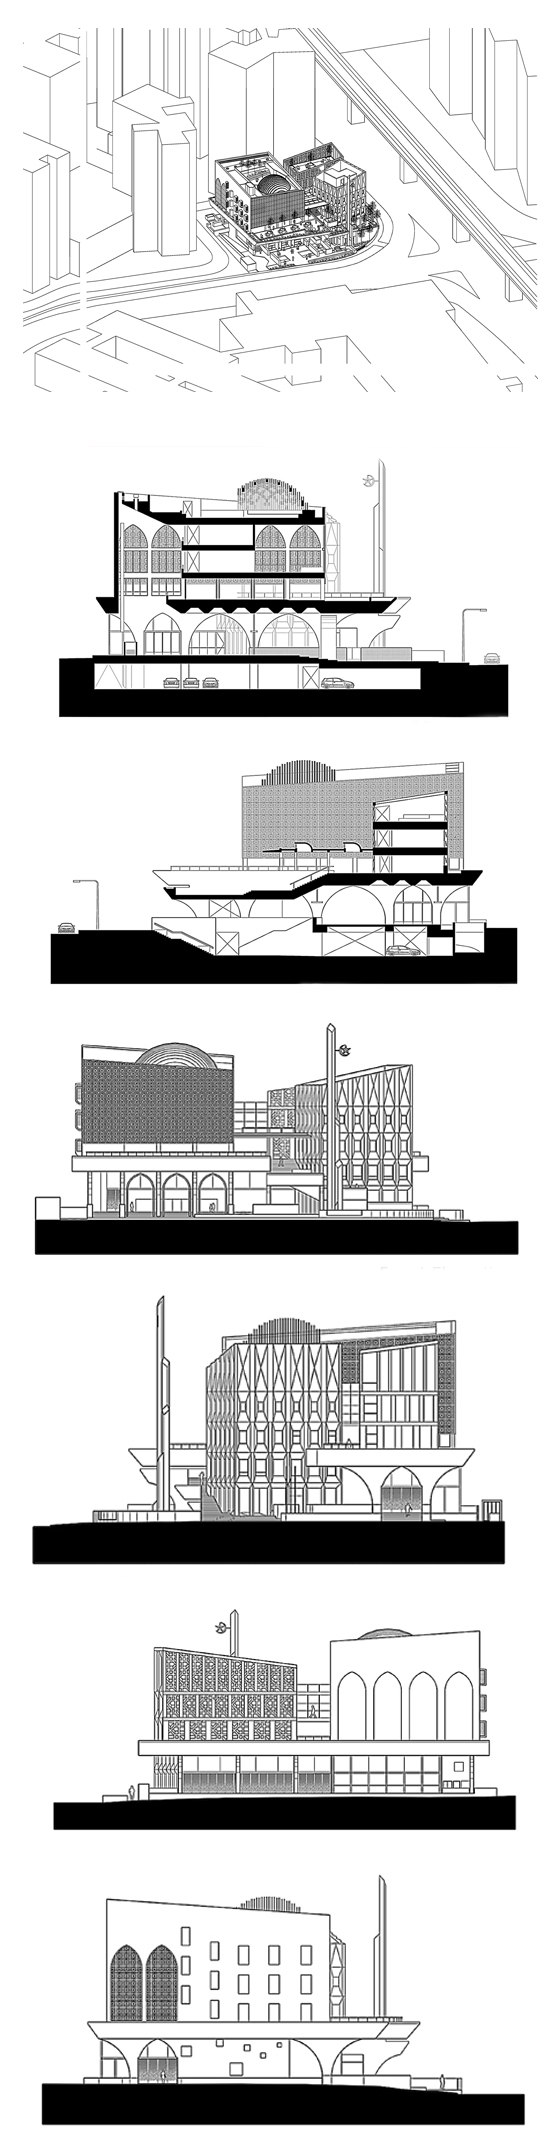 Al Islah Mosque by Formwerkz   Church architecture / community centres